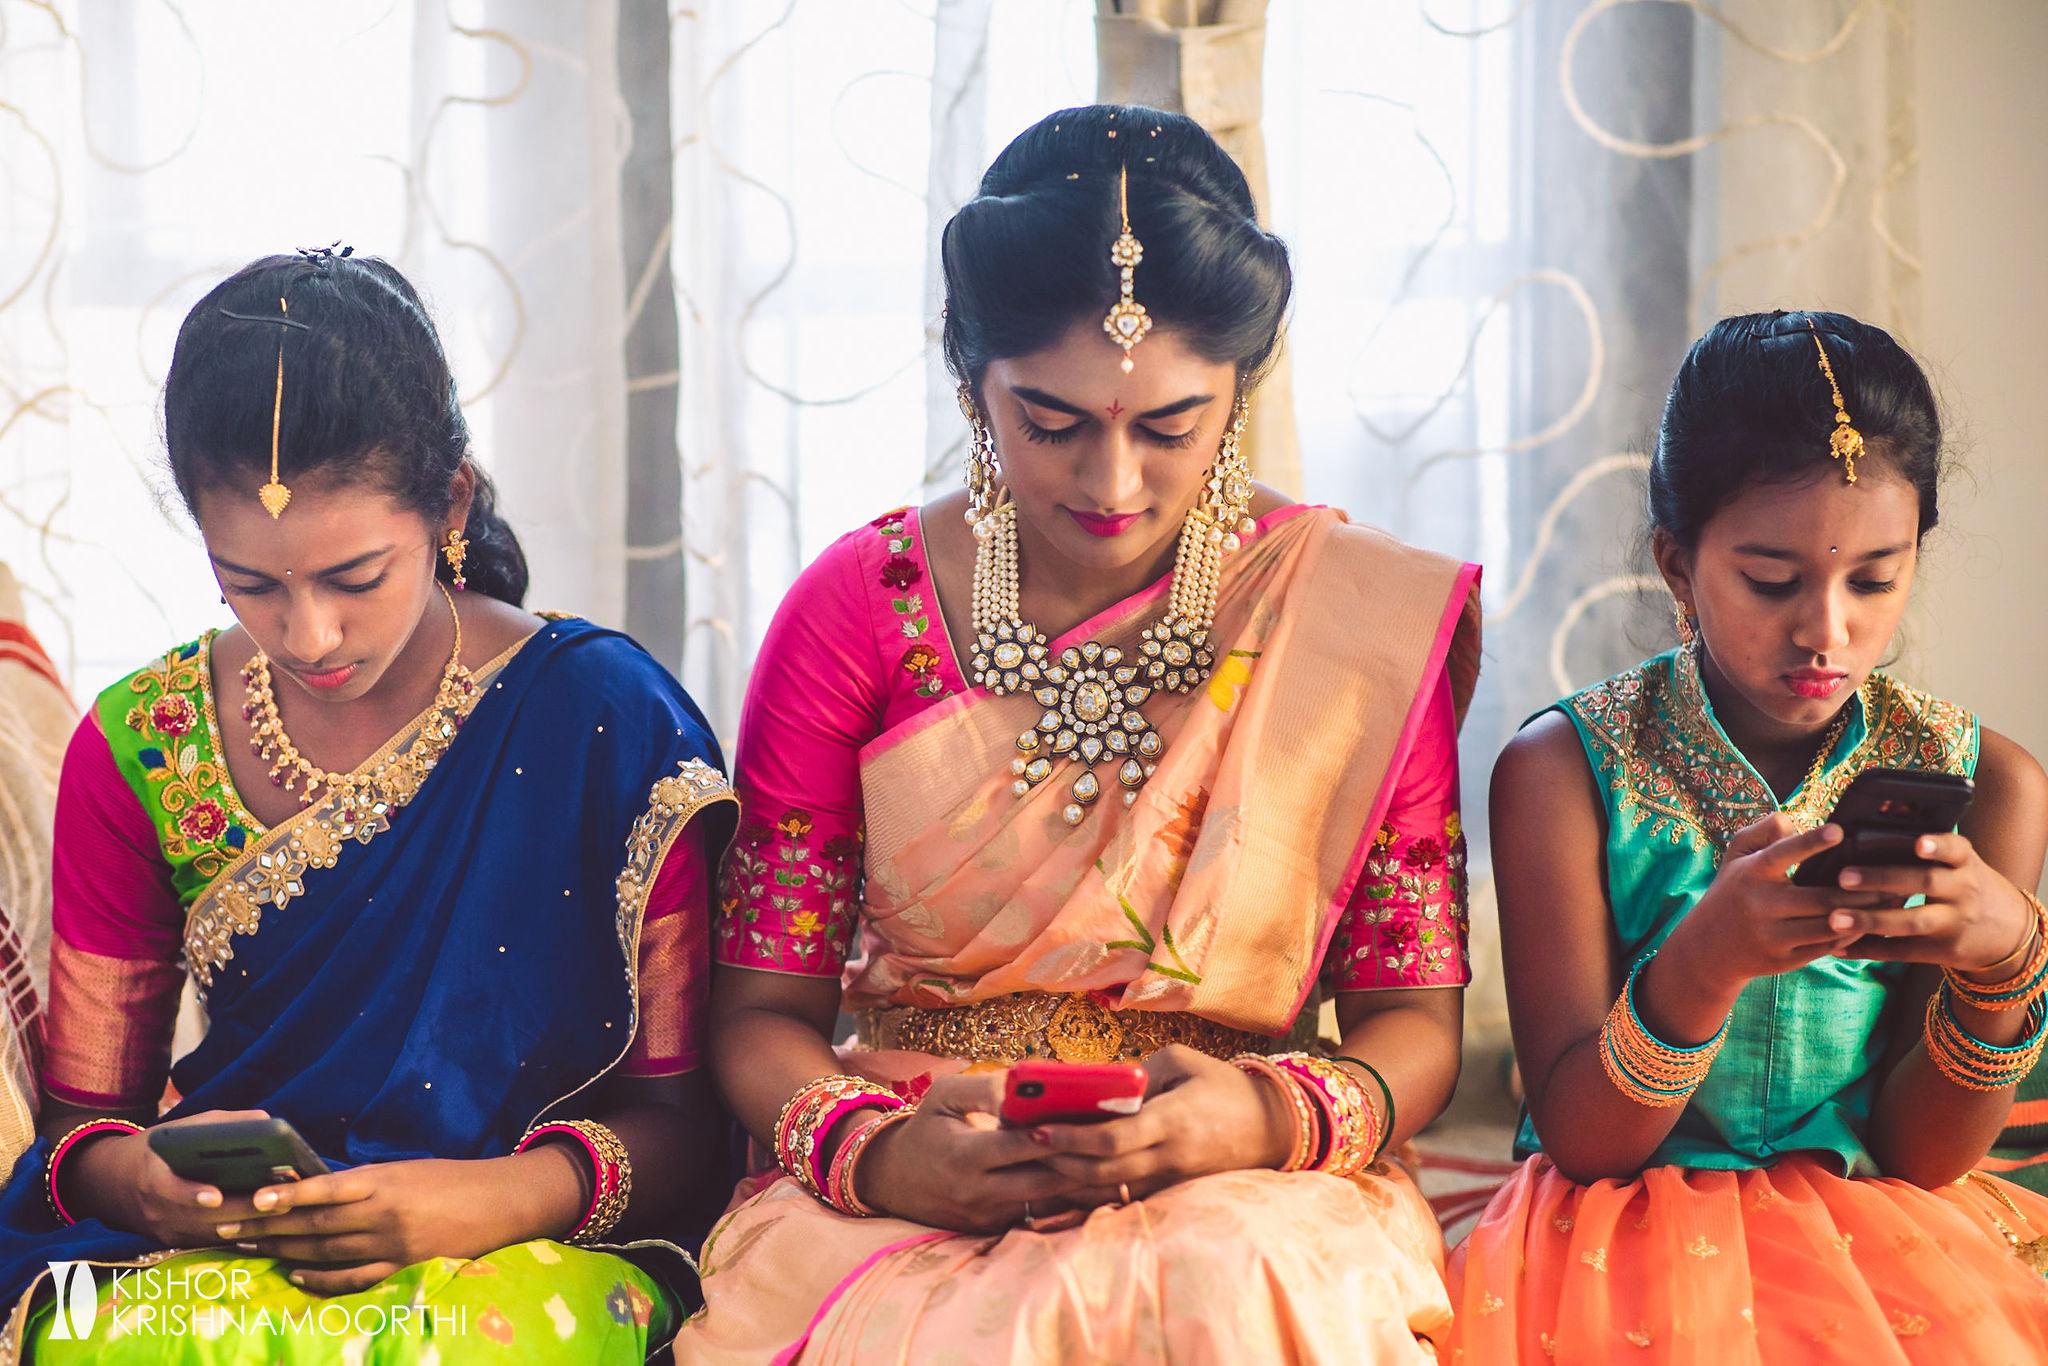 pellikuthuru-bridal-look-traditional-telugu-wedding-south-Indian-marriage-fun-kishorkrishnamoorthi